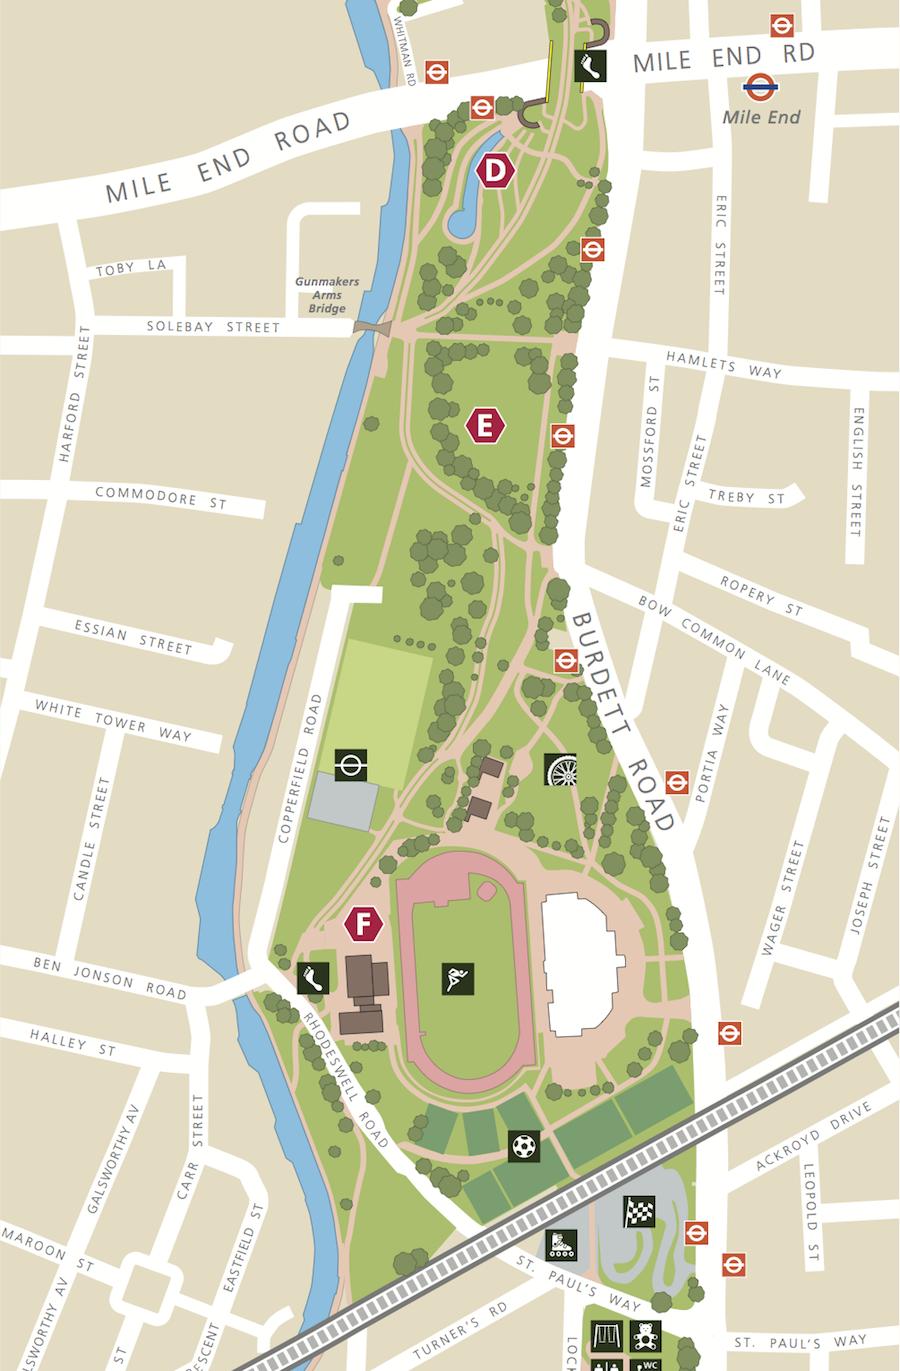 Mile End stadium map